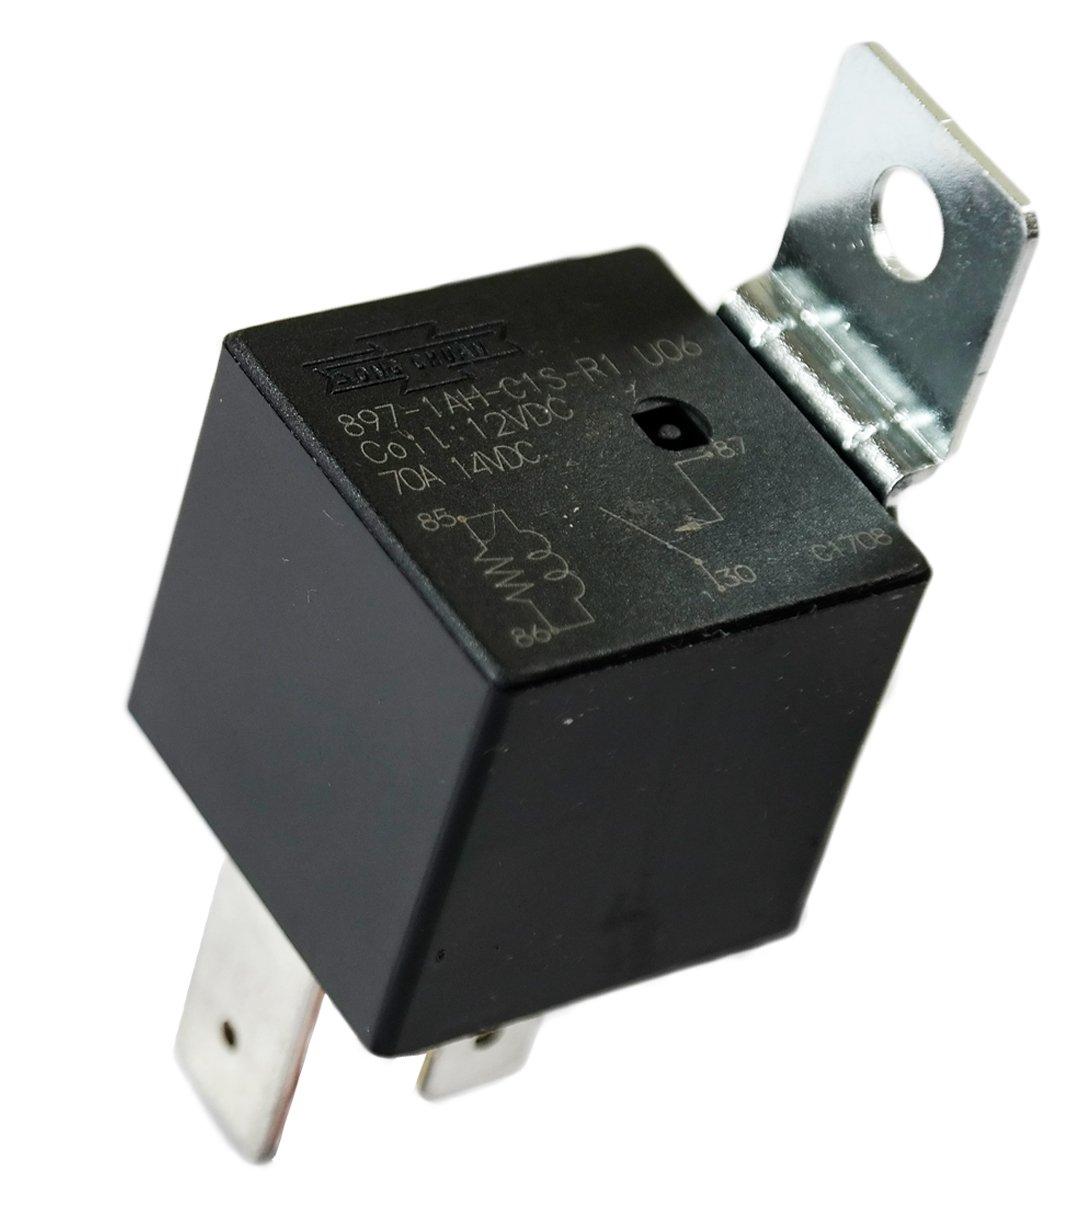 Song Chuan 12VDC Hi-Power W/Resist, Automotive General Purpose Relays